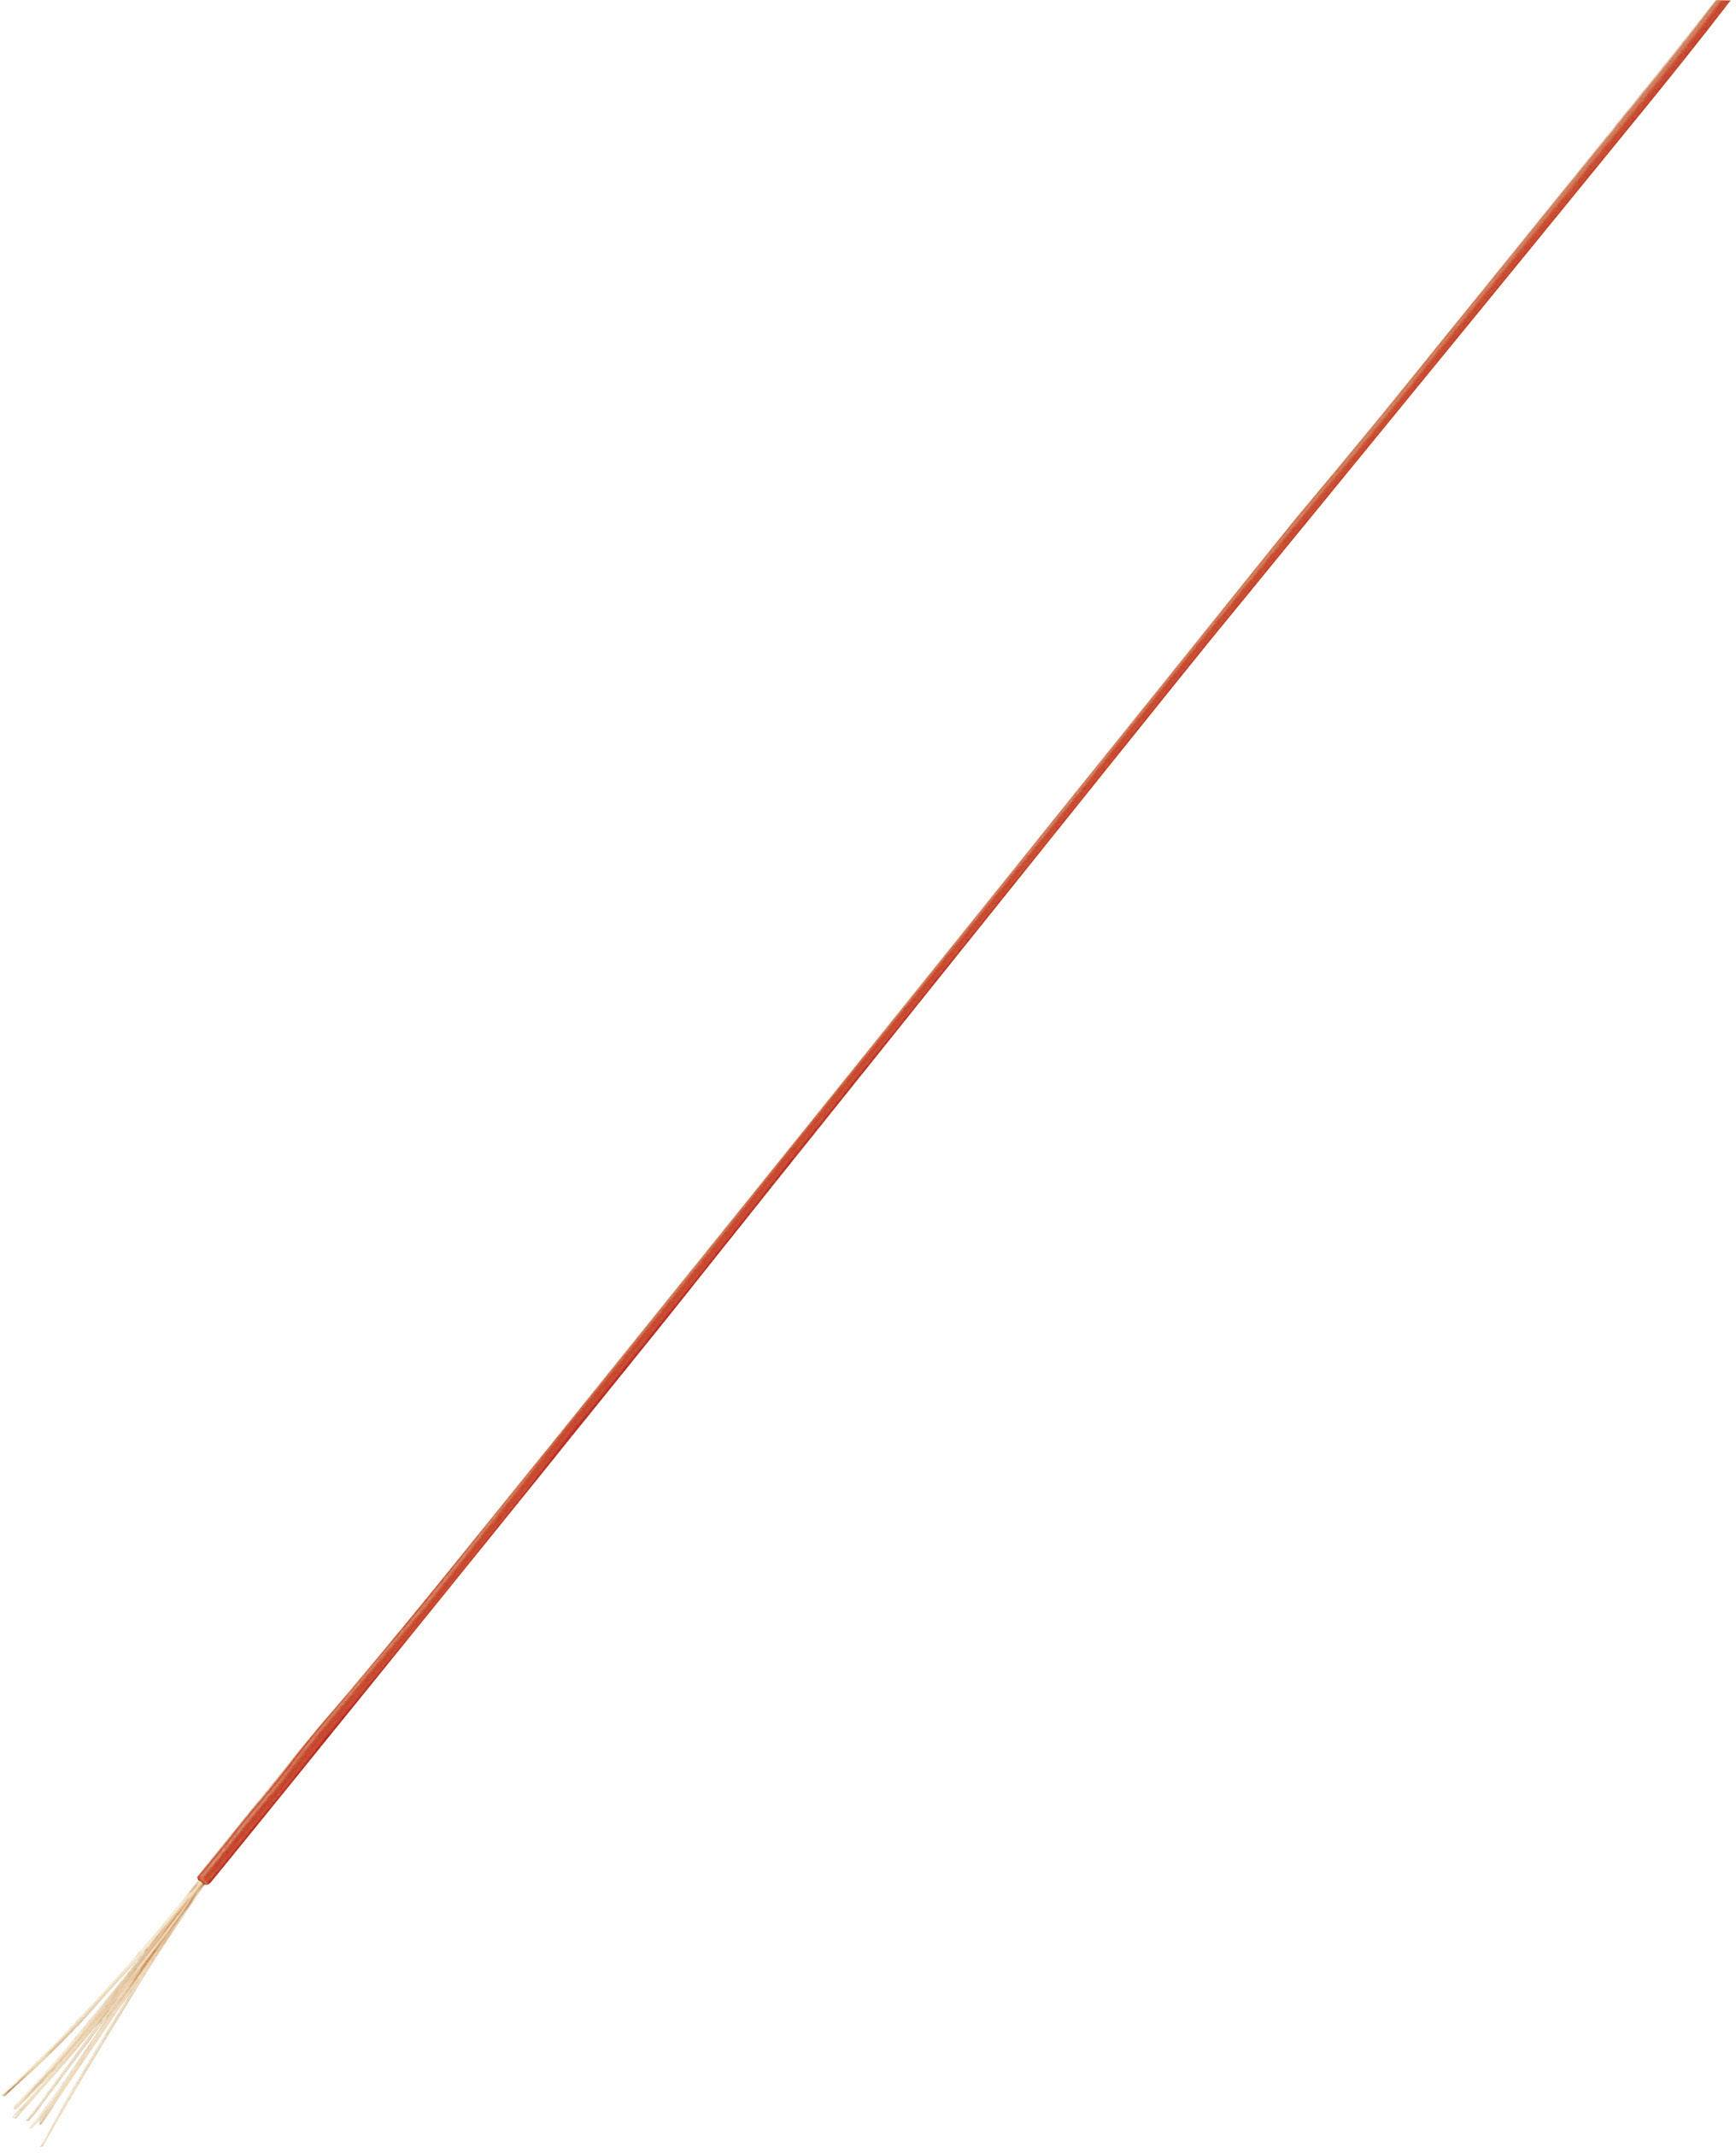 Opletenie / lanko Conrad Components 1180315 LiFY, 1 x 0.25 mm², vonkajší Ø 1 mm, 25 m, červená